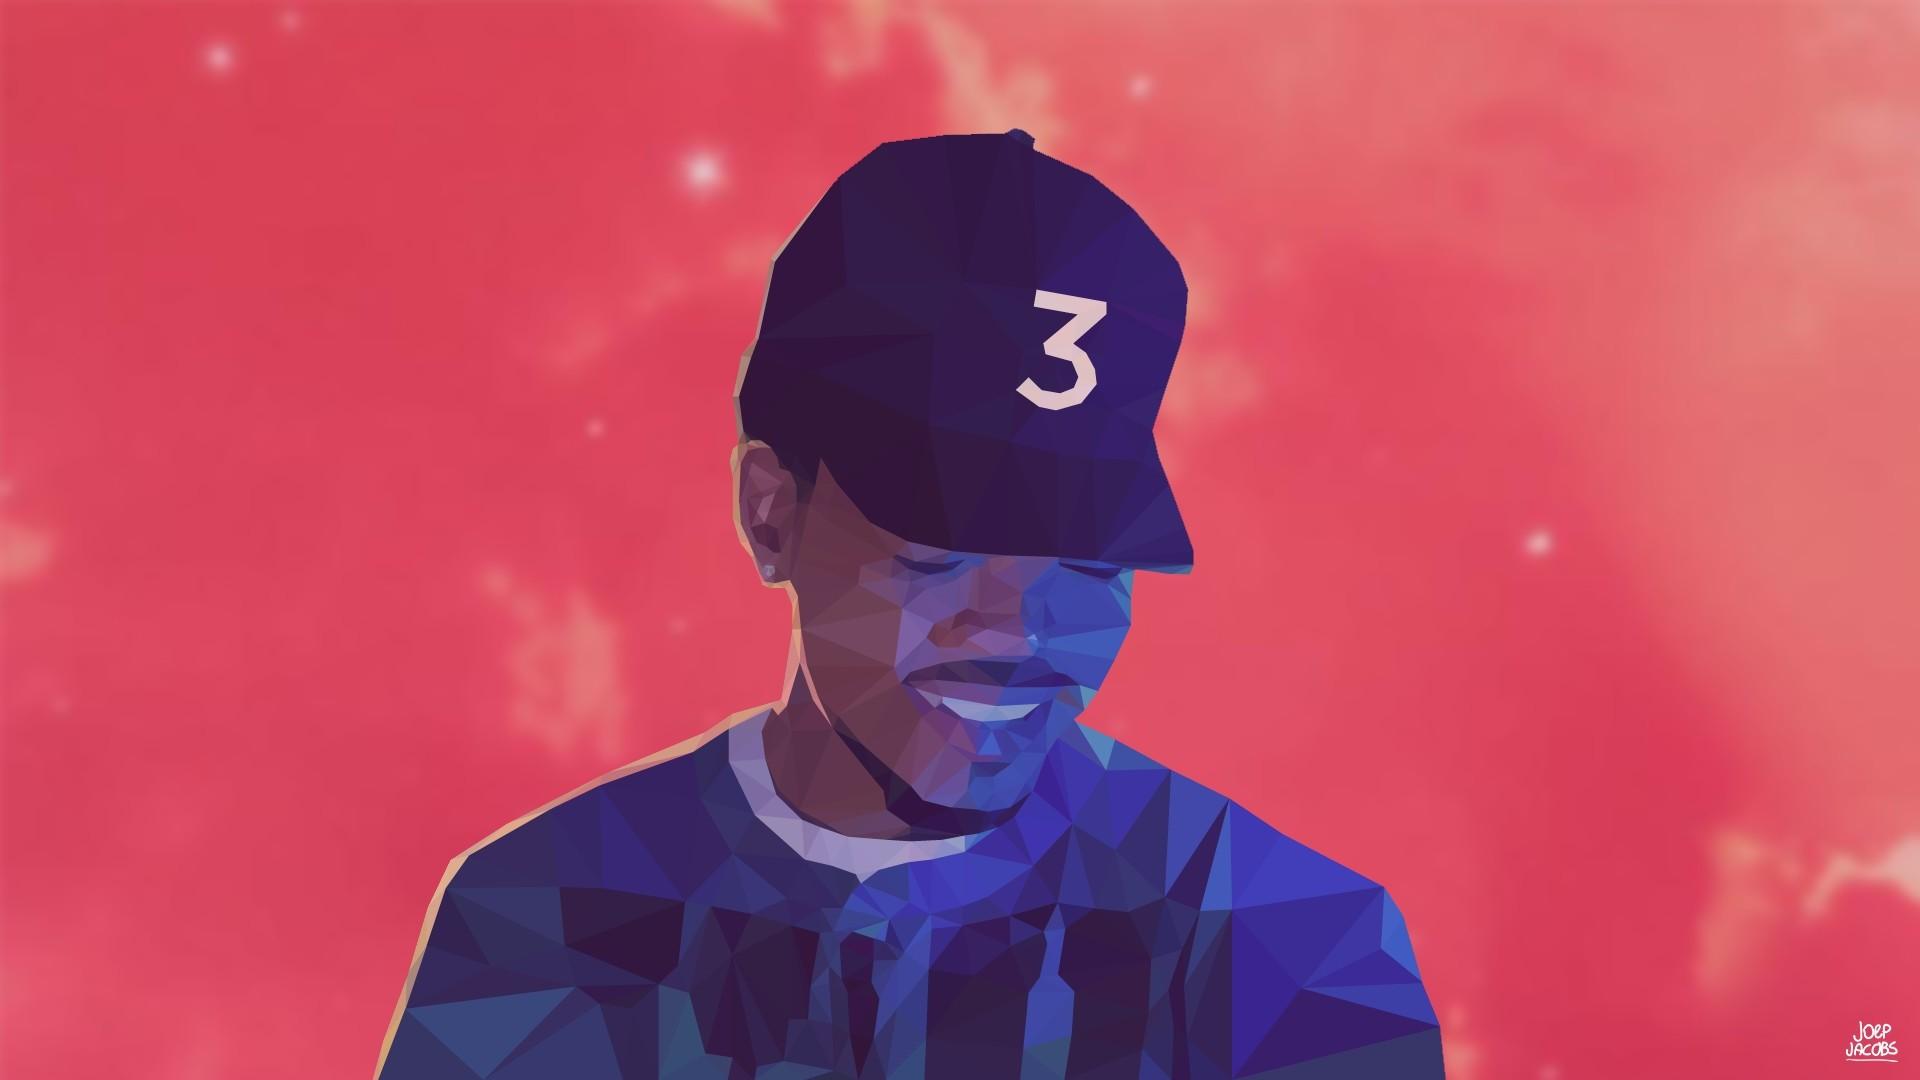 Chance The Rapper Wallpaper image hd